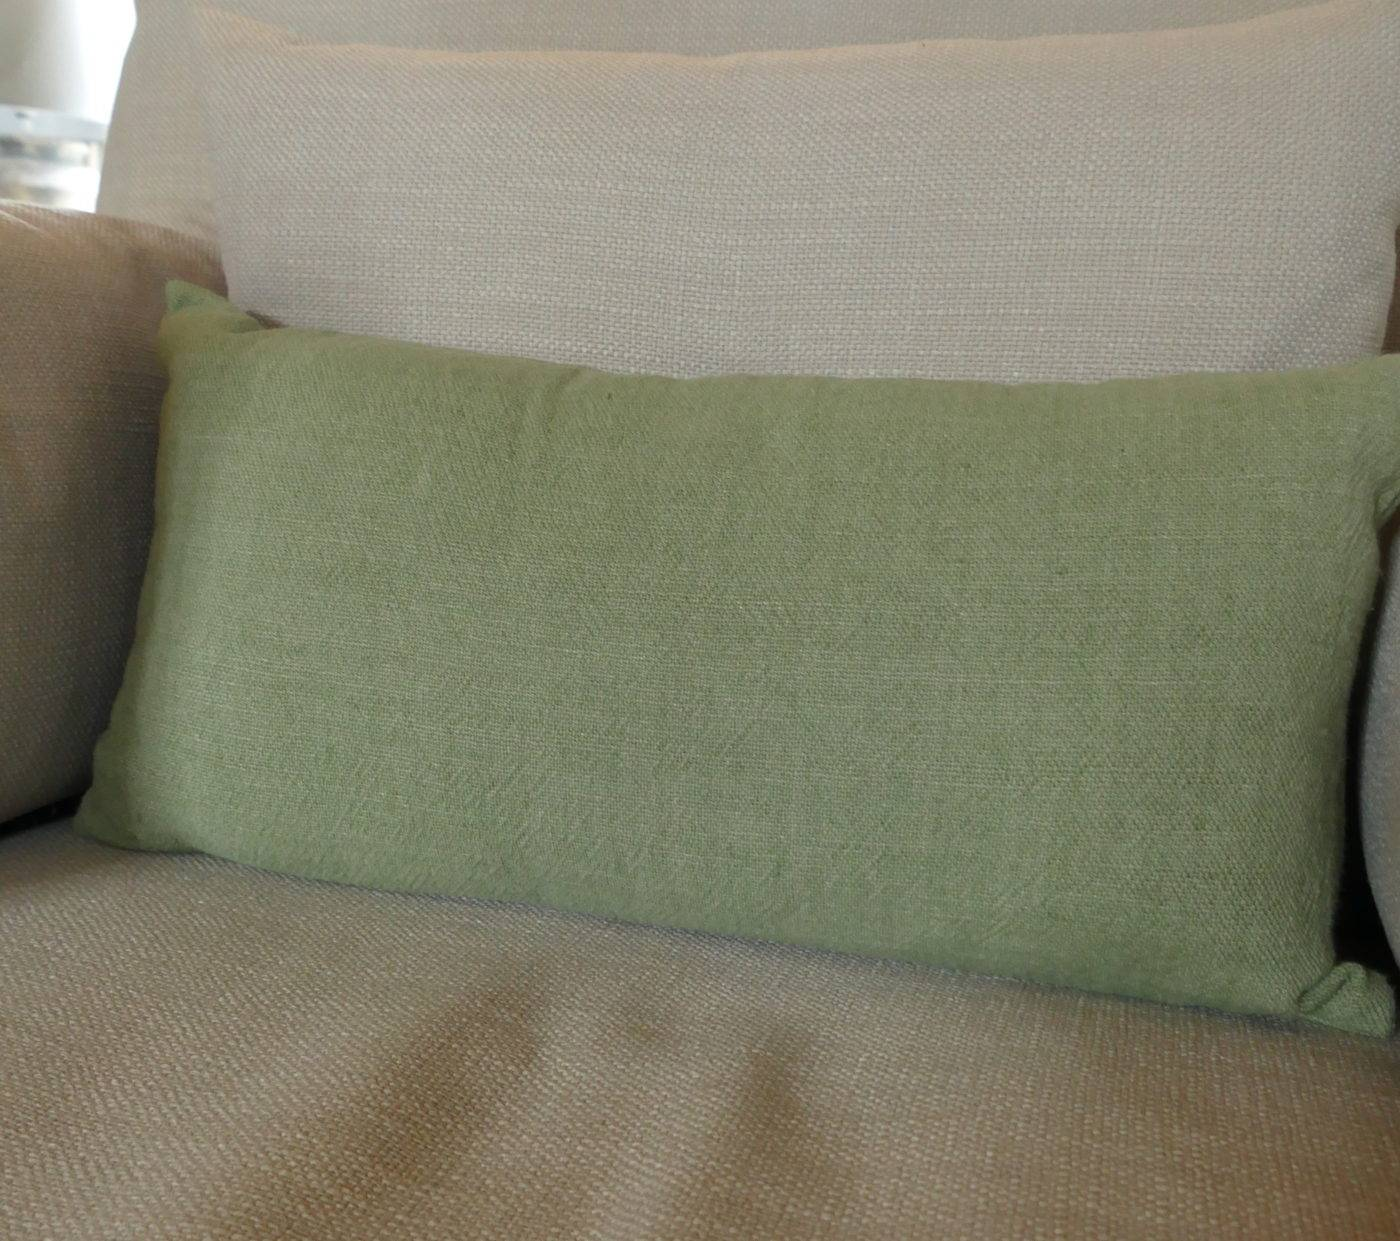 green twill rectangular cushion on sofa